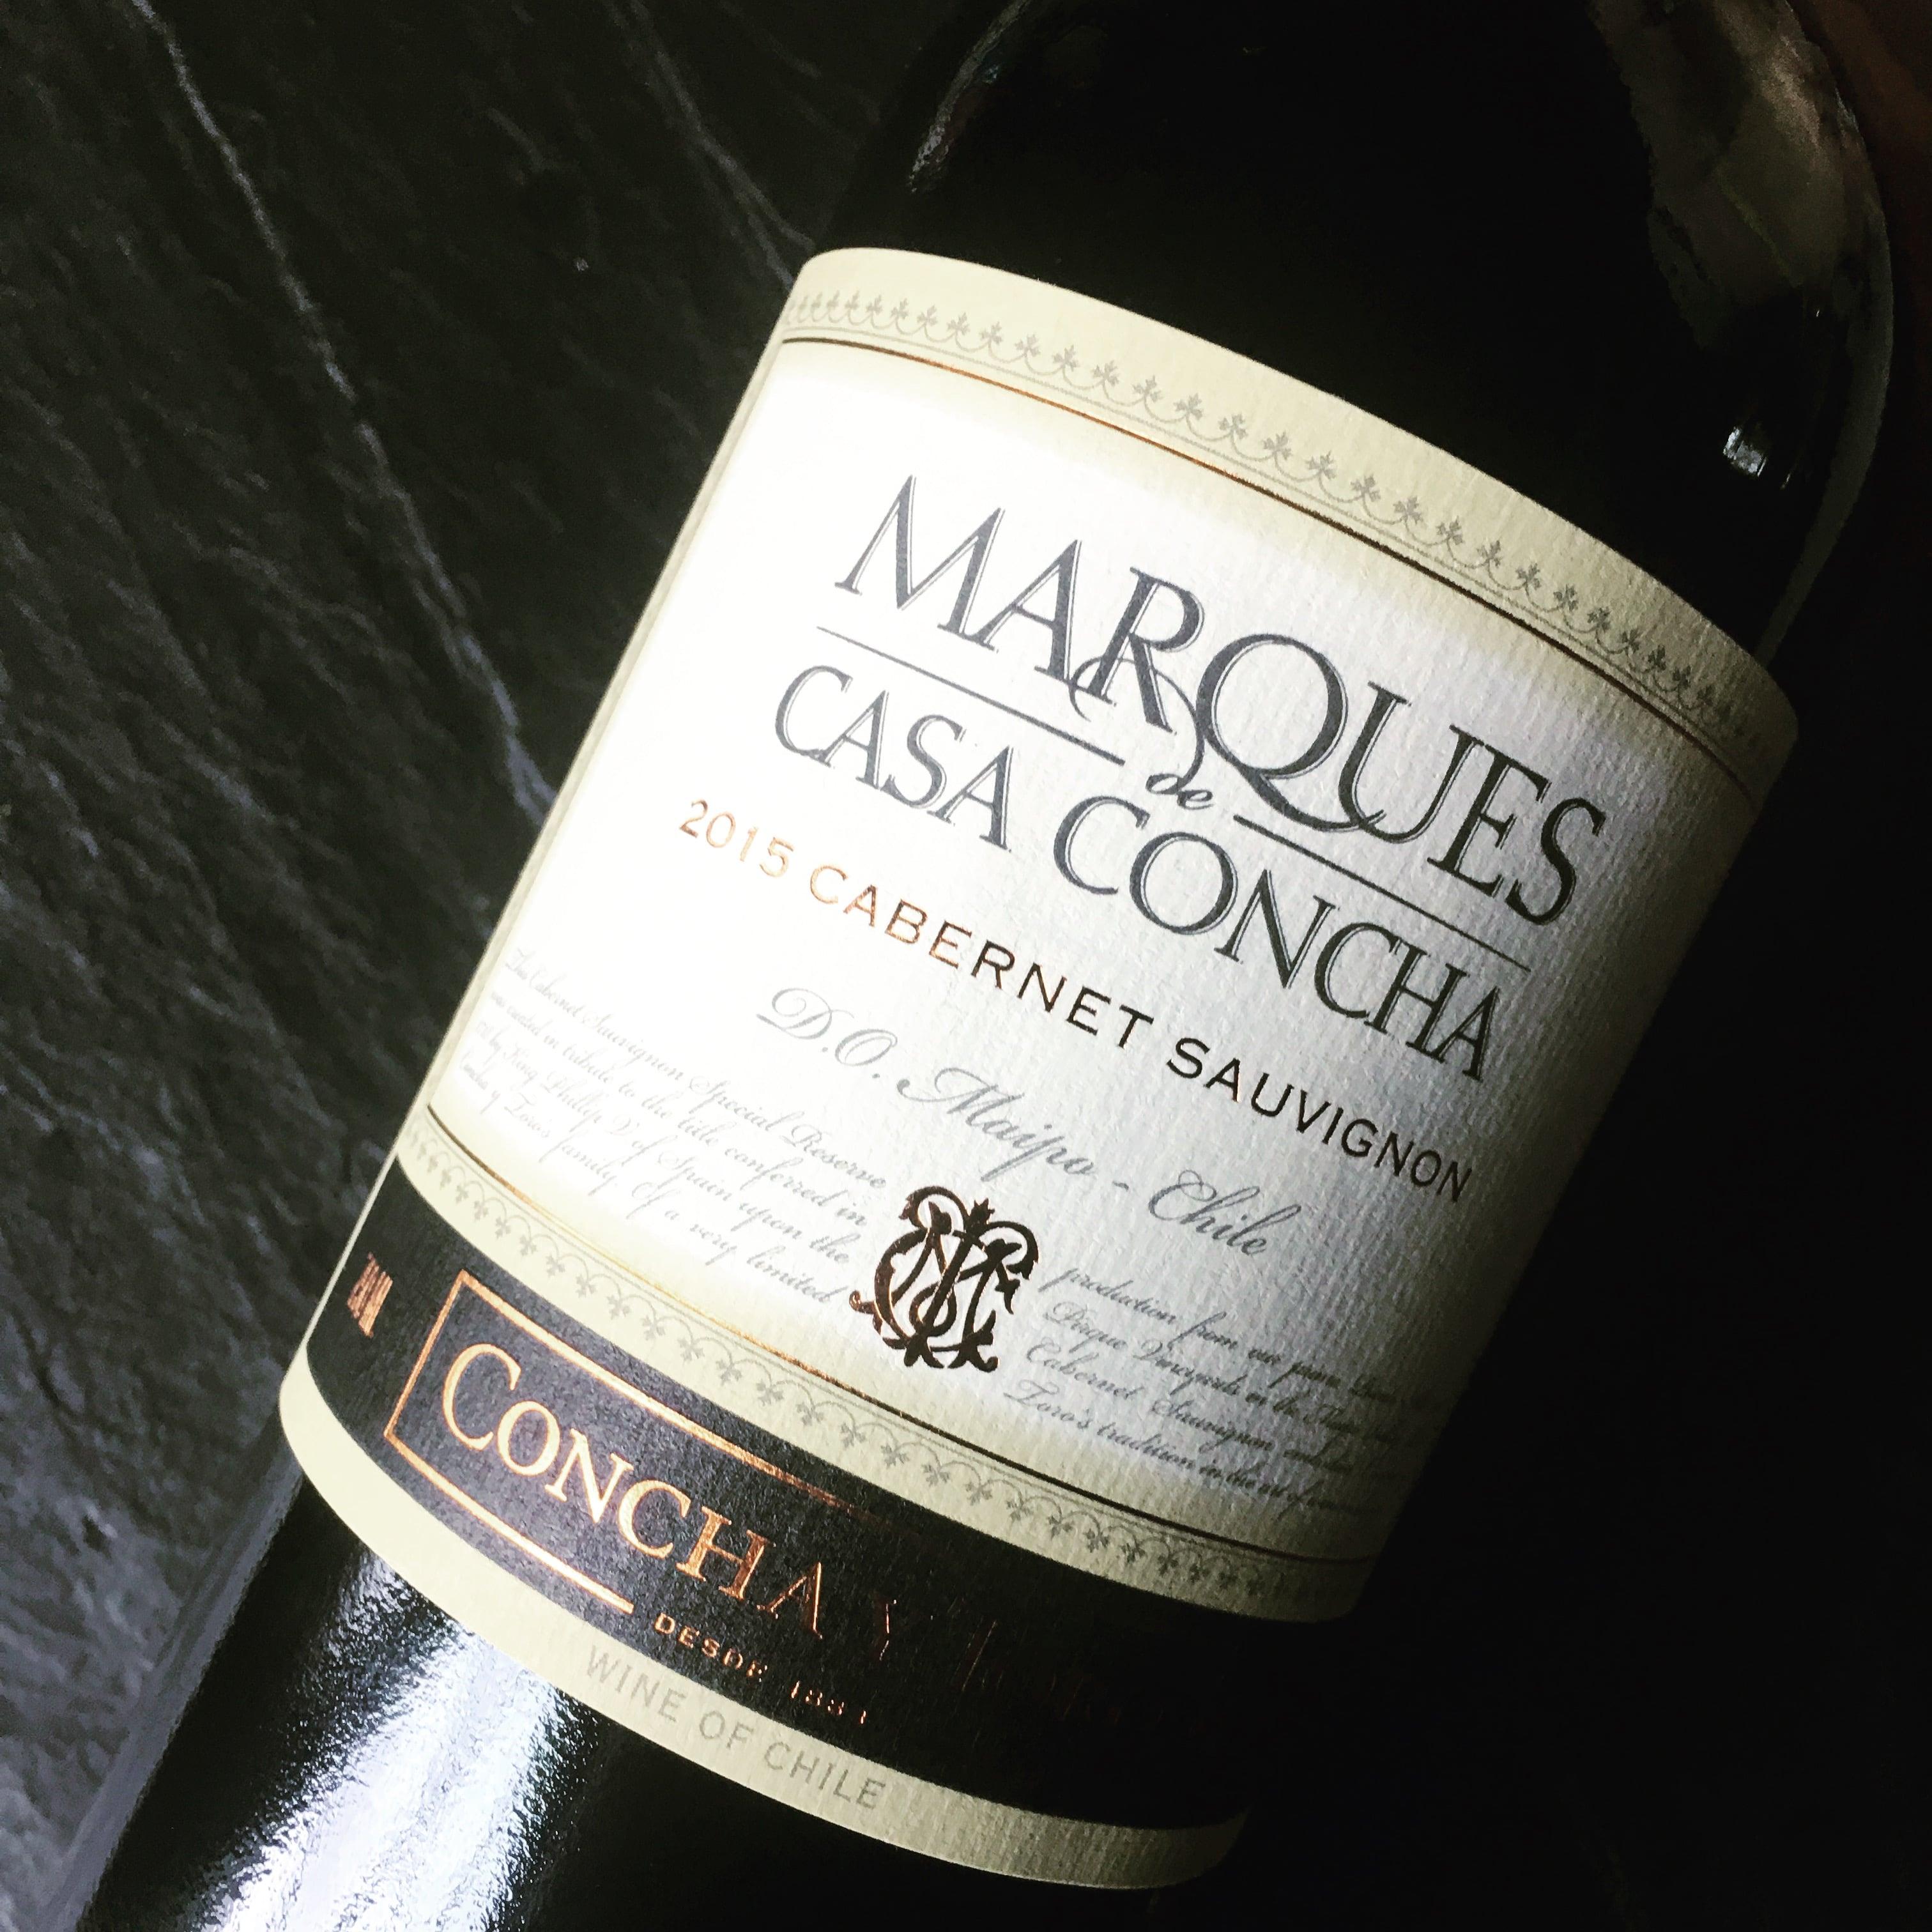 Concha y Toro Cabernet Sauvignon Marqués de Casa Concha 2015